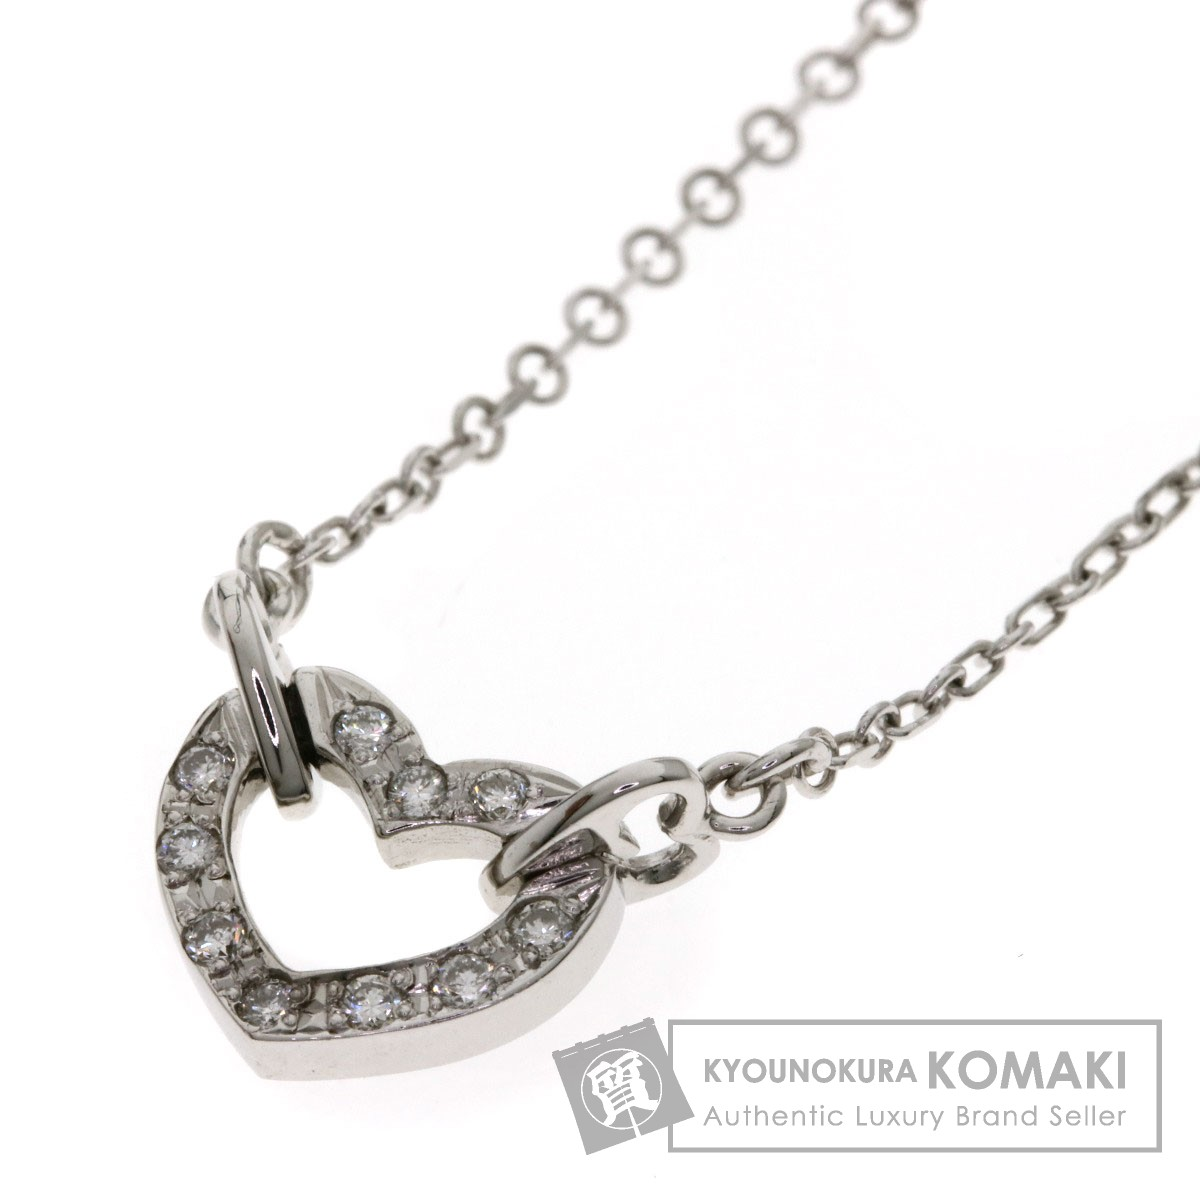 0.1ct メレダイヤモンド ハートモチーフ ネックレス K18ホワイトゴールド 2.8g レディース 【中古】